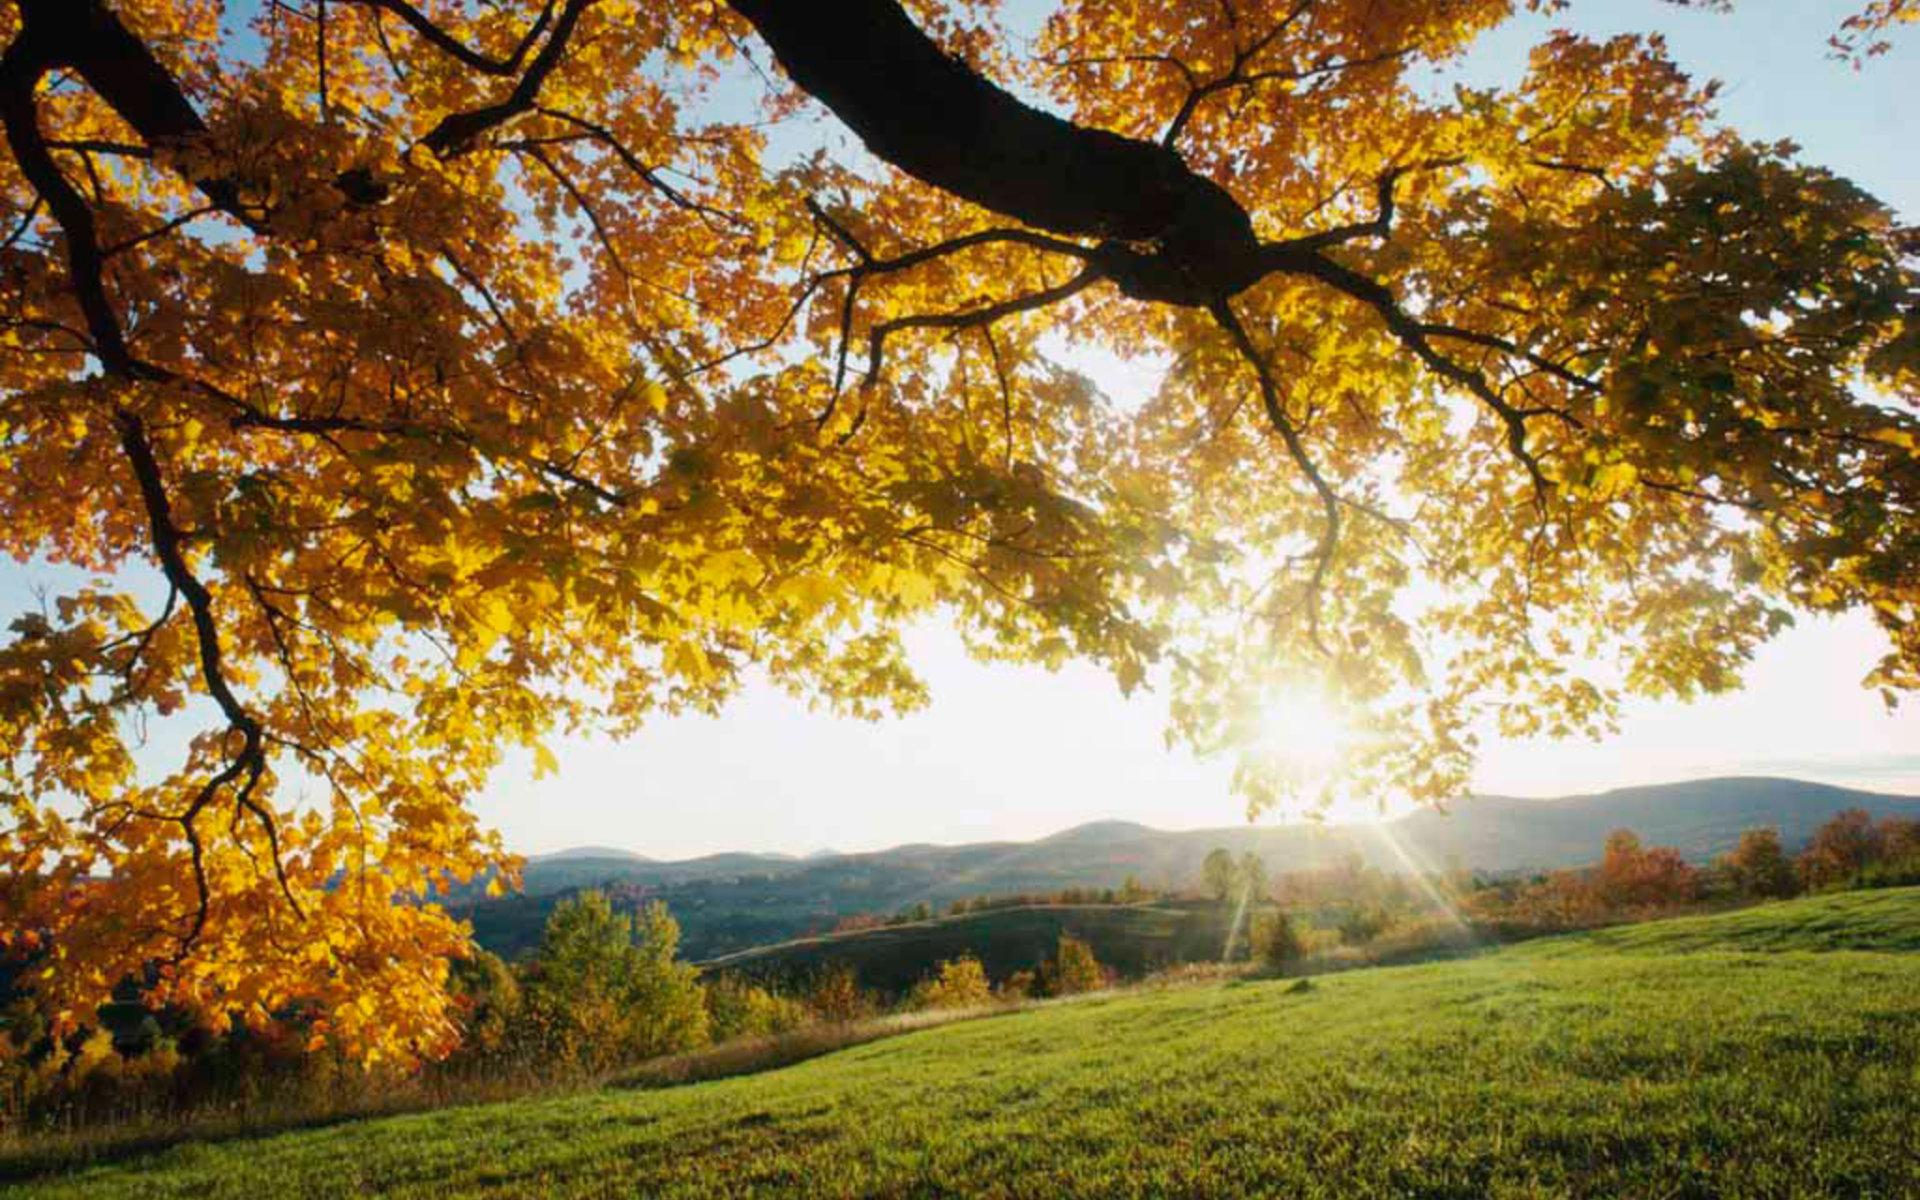 Landscape Morning Wallpaper